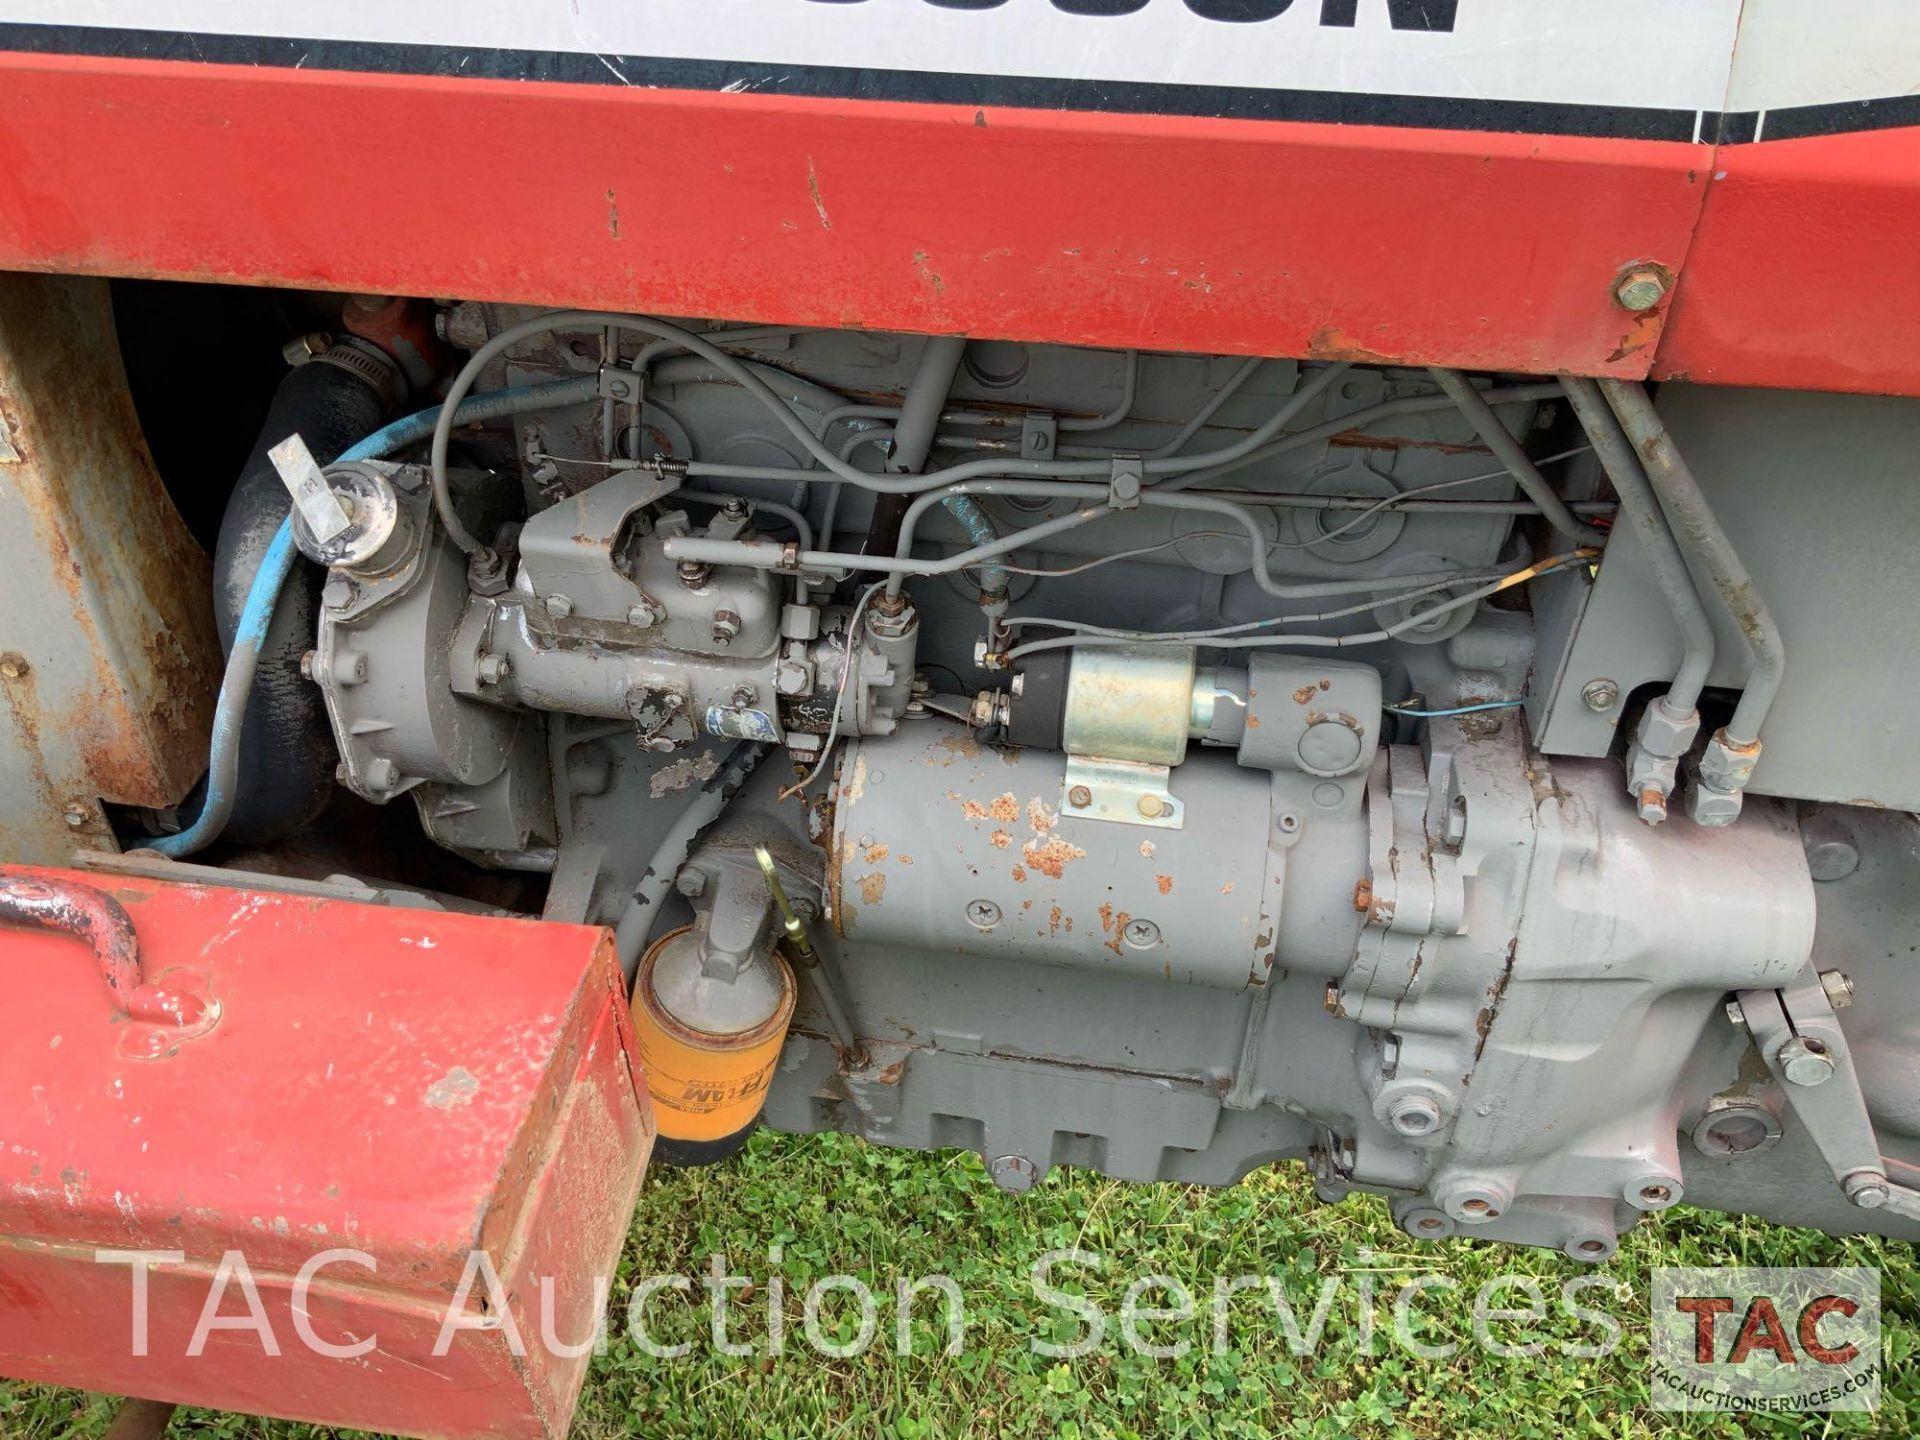 Massey Ferguson 275 Farm Tractor - Image 17 of 25